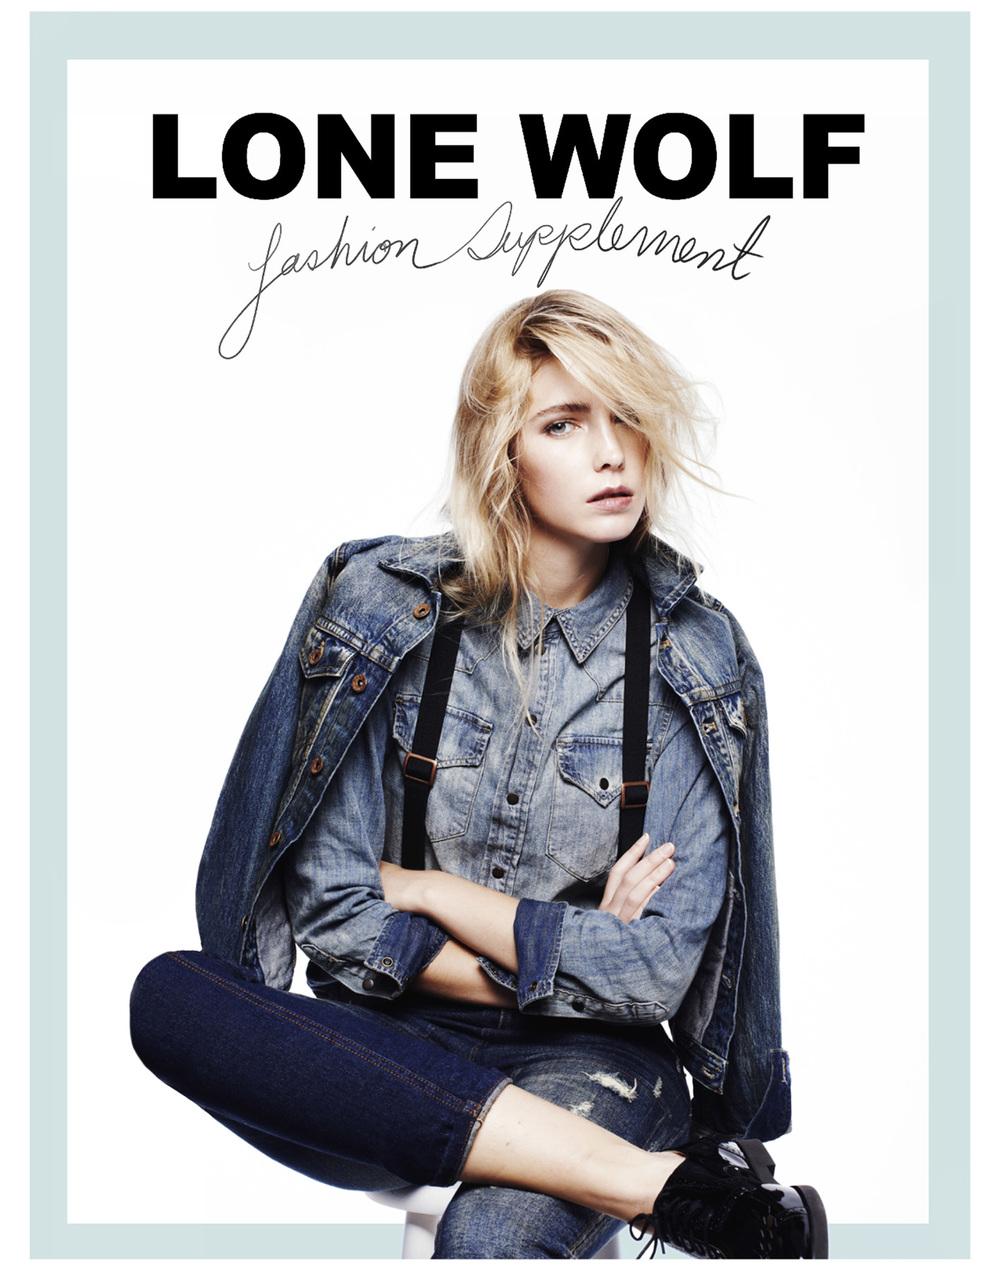 lonewolf_1.jpg